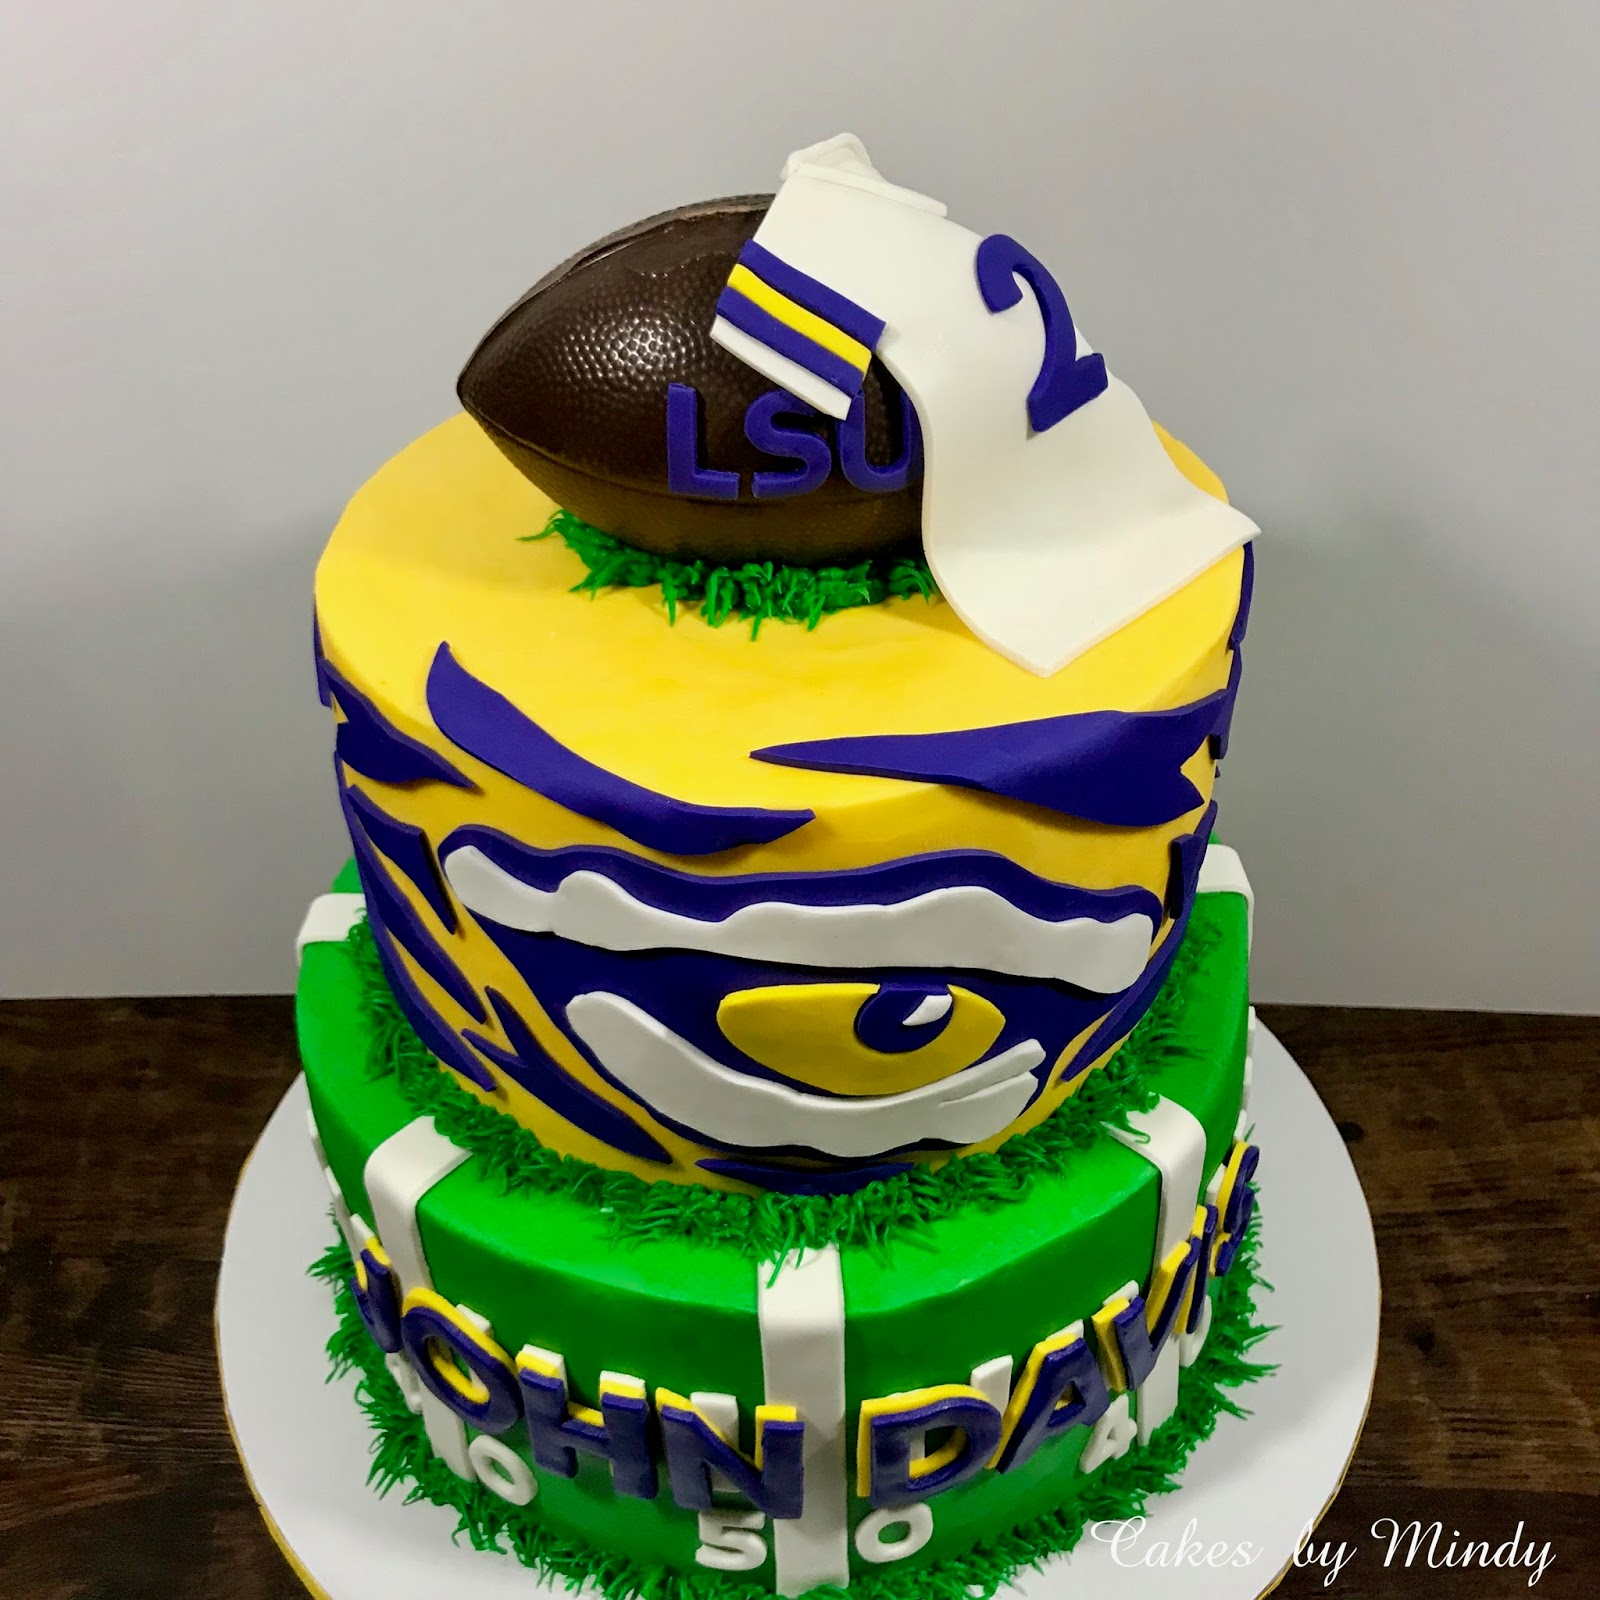 Phenomenal Cakes By Mindy Lsu Tigers Birthday Cake 8 10 Funny Birthday Cards Online Necthendildamsfinfo